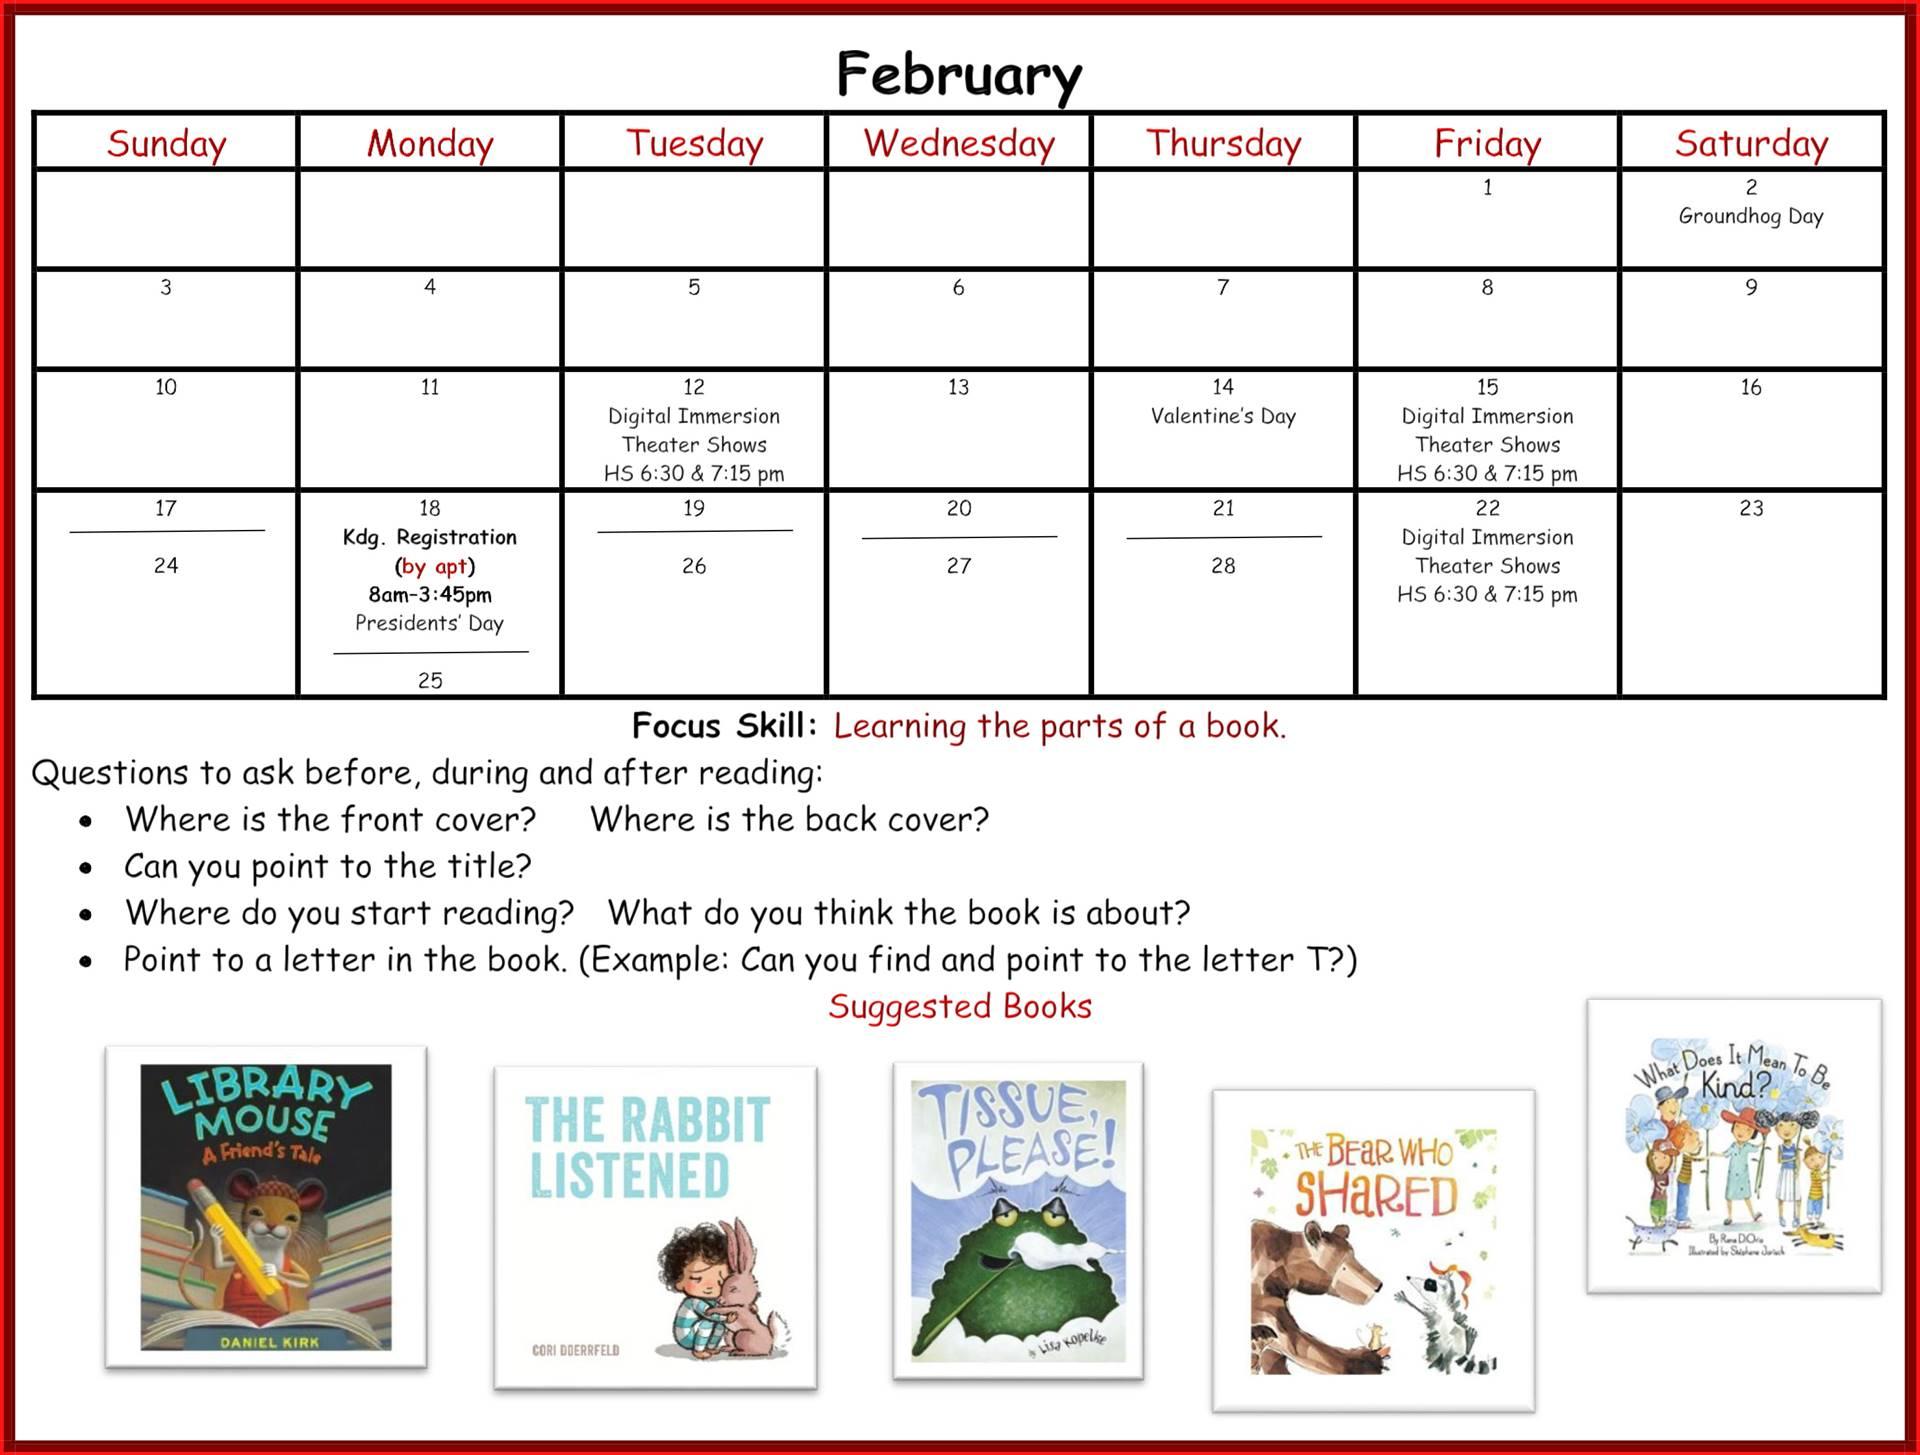 Kindergarten Readiness Calendar - February page 1